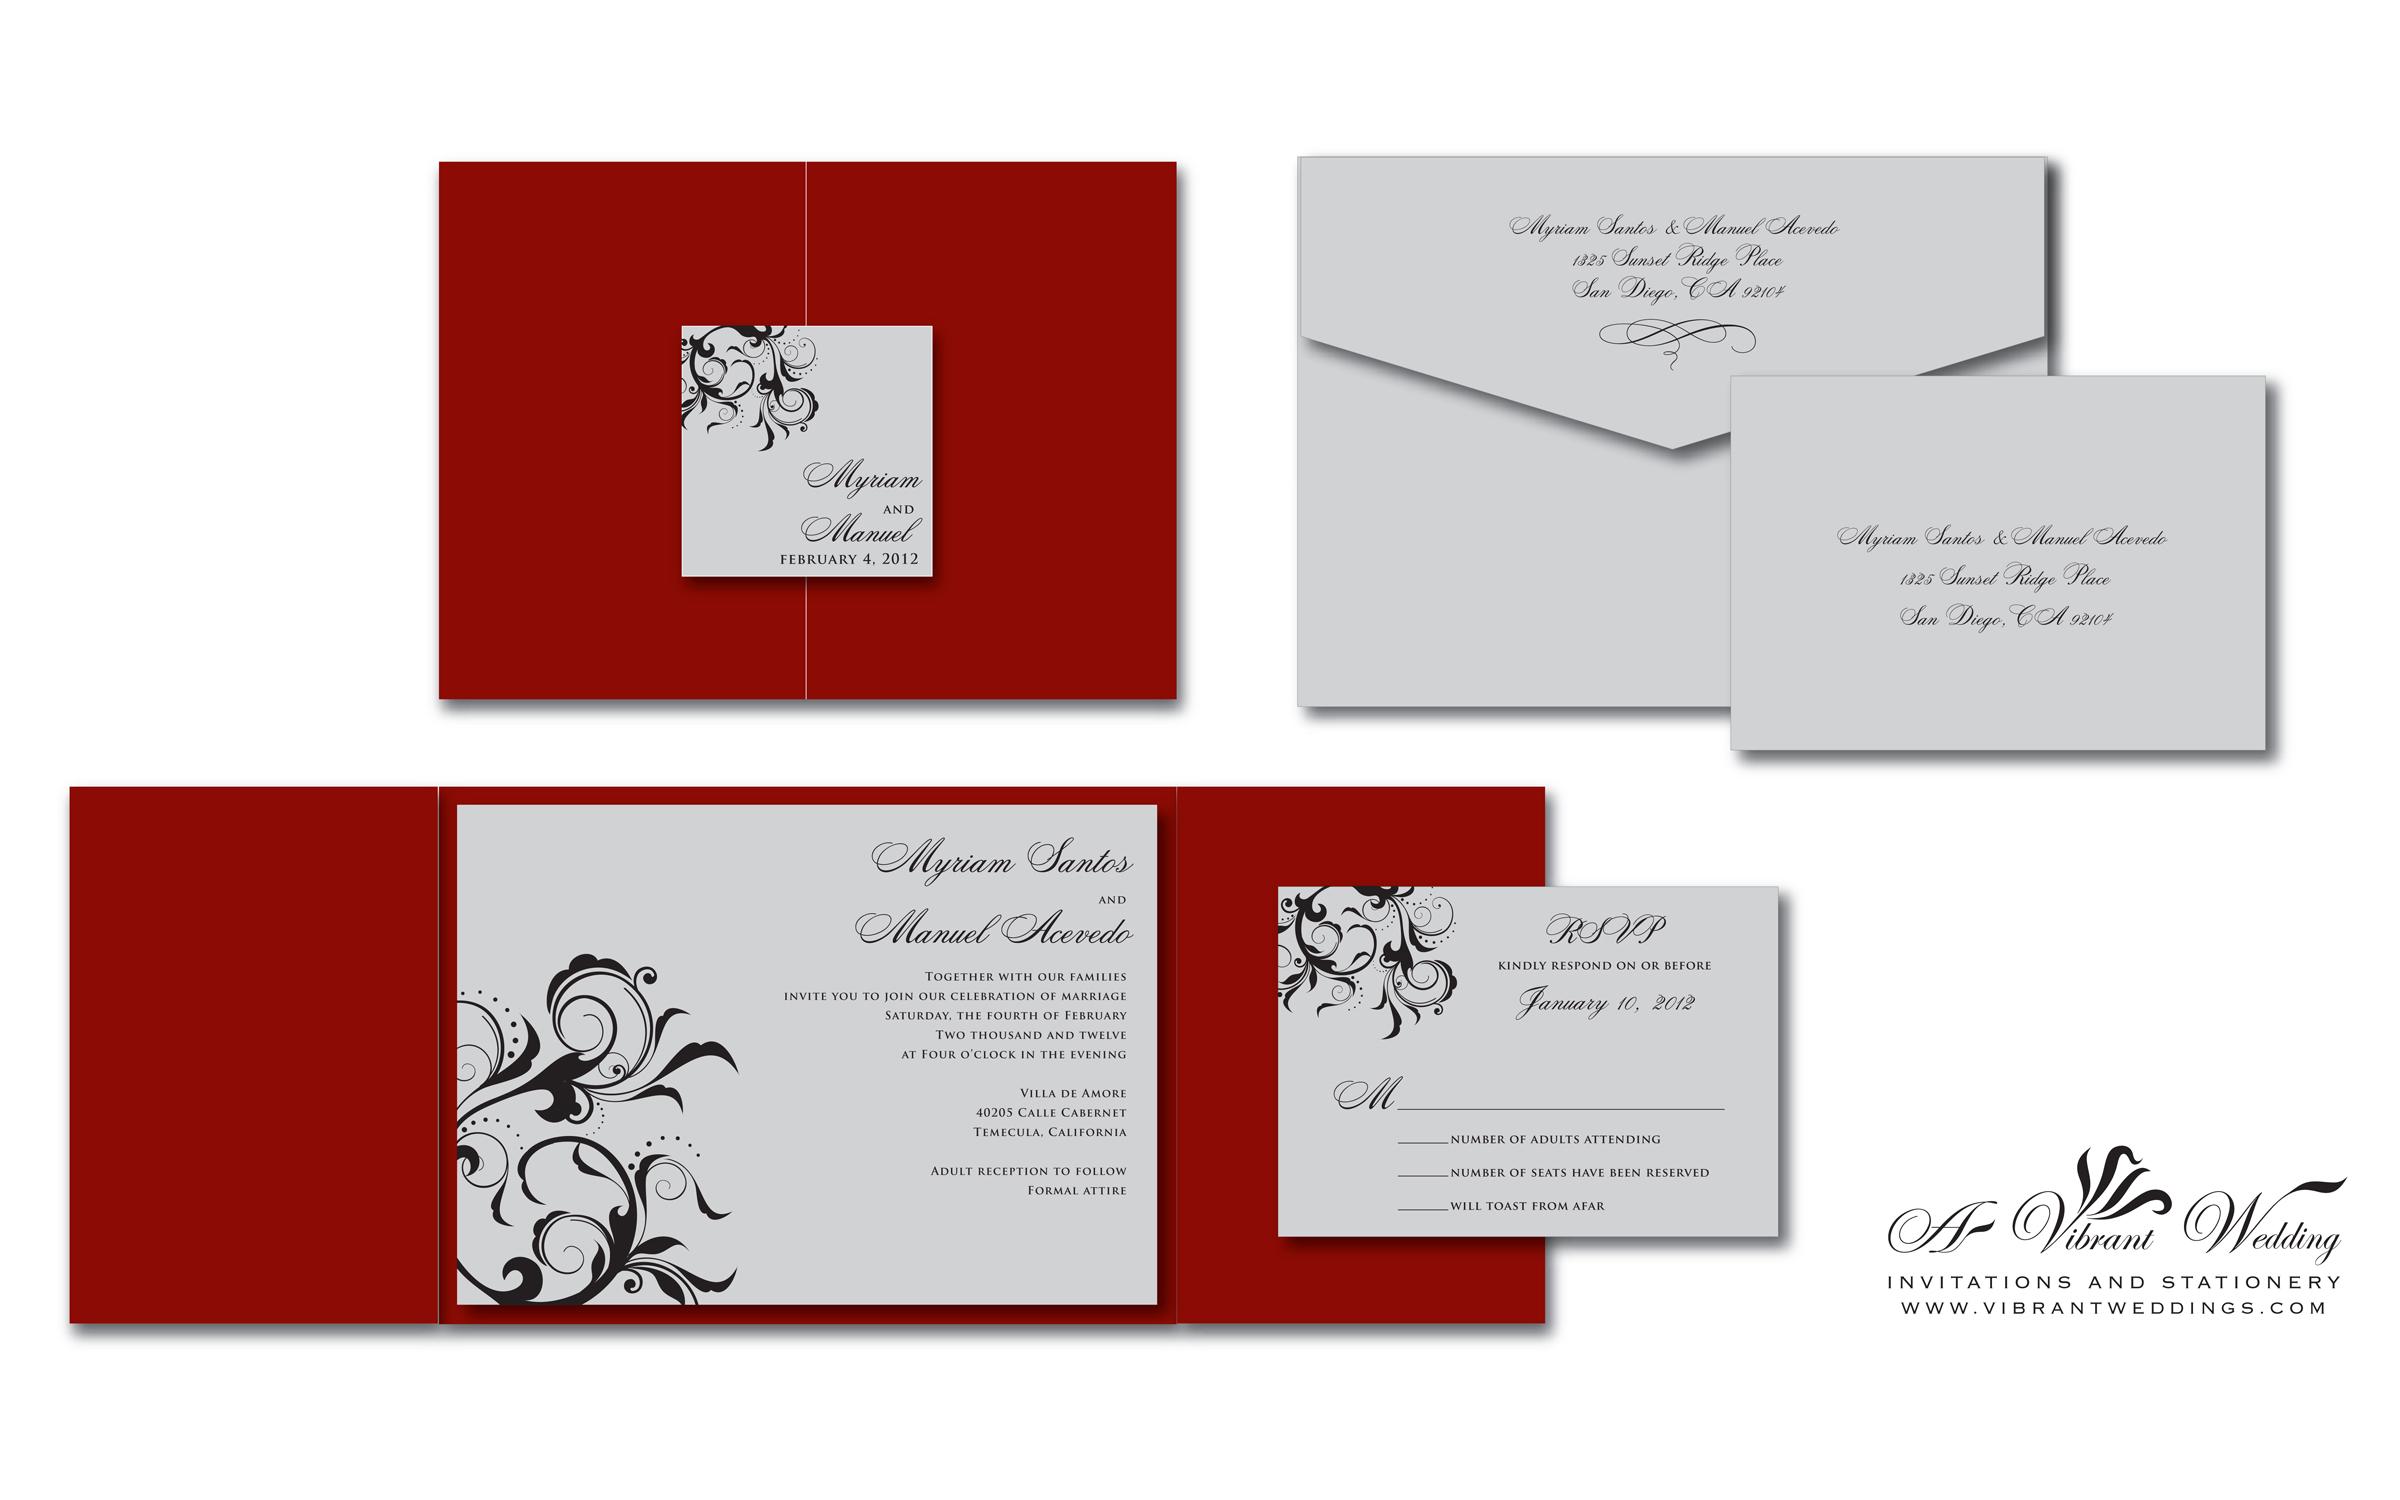 Wedding Scroll Invitation with adorable invitation sample